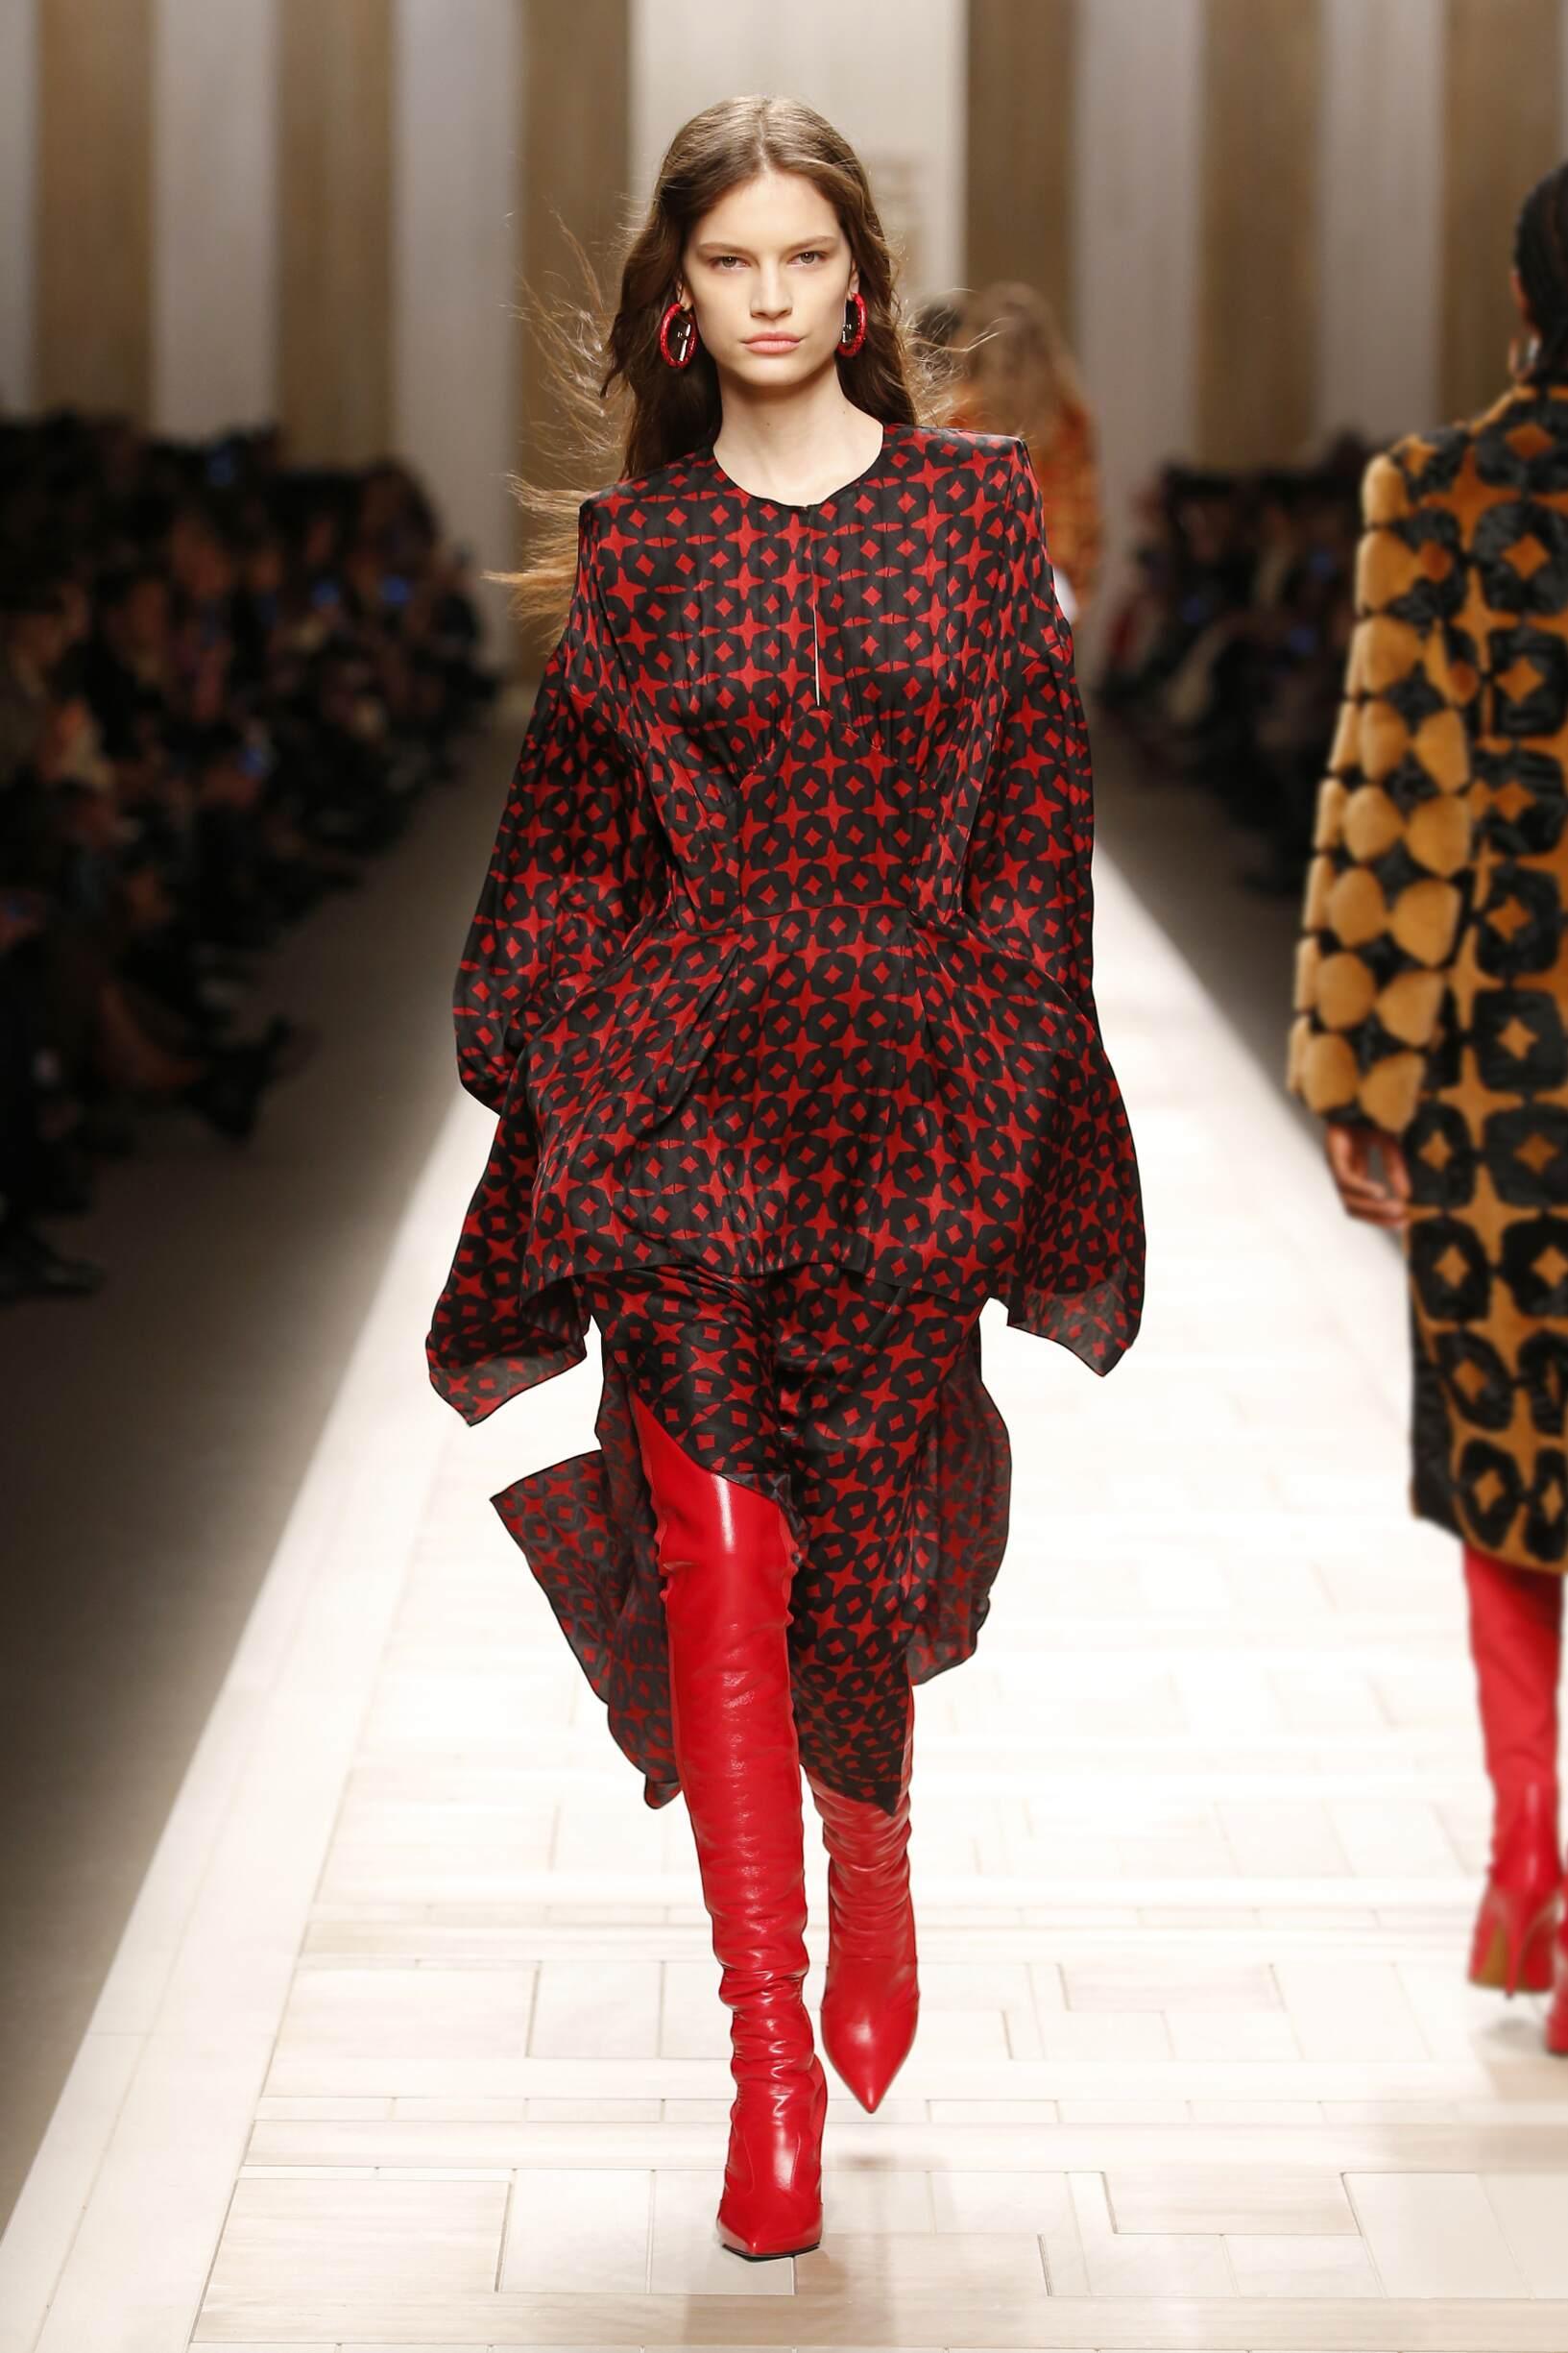 d3cfb4e604 Fendi Fall Winter 2017 Womens Collection Milan Fashion Week